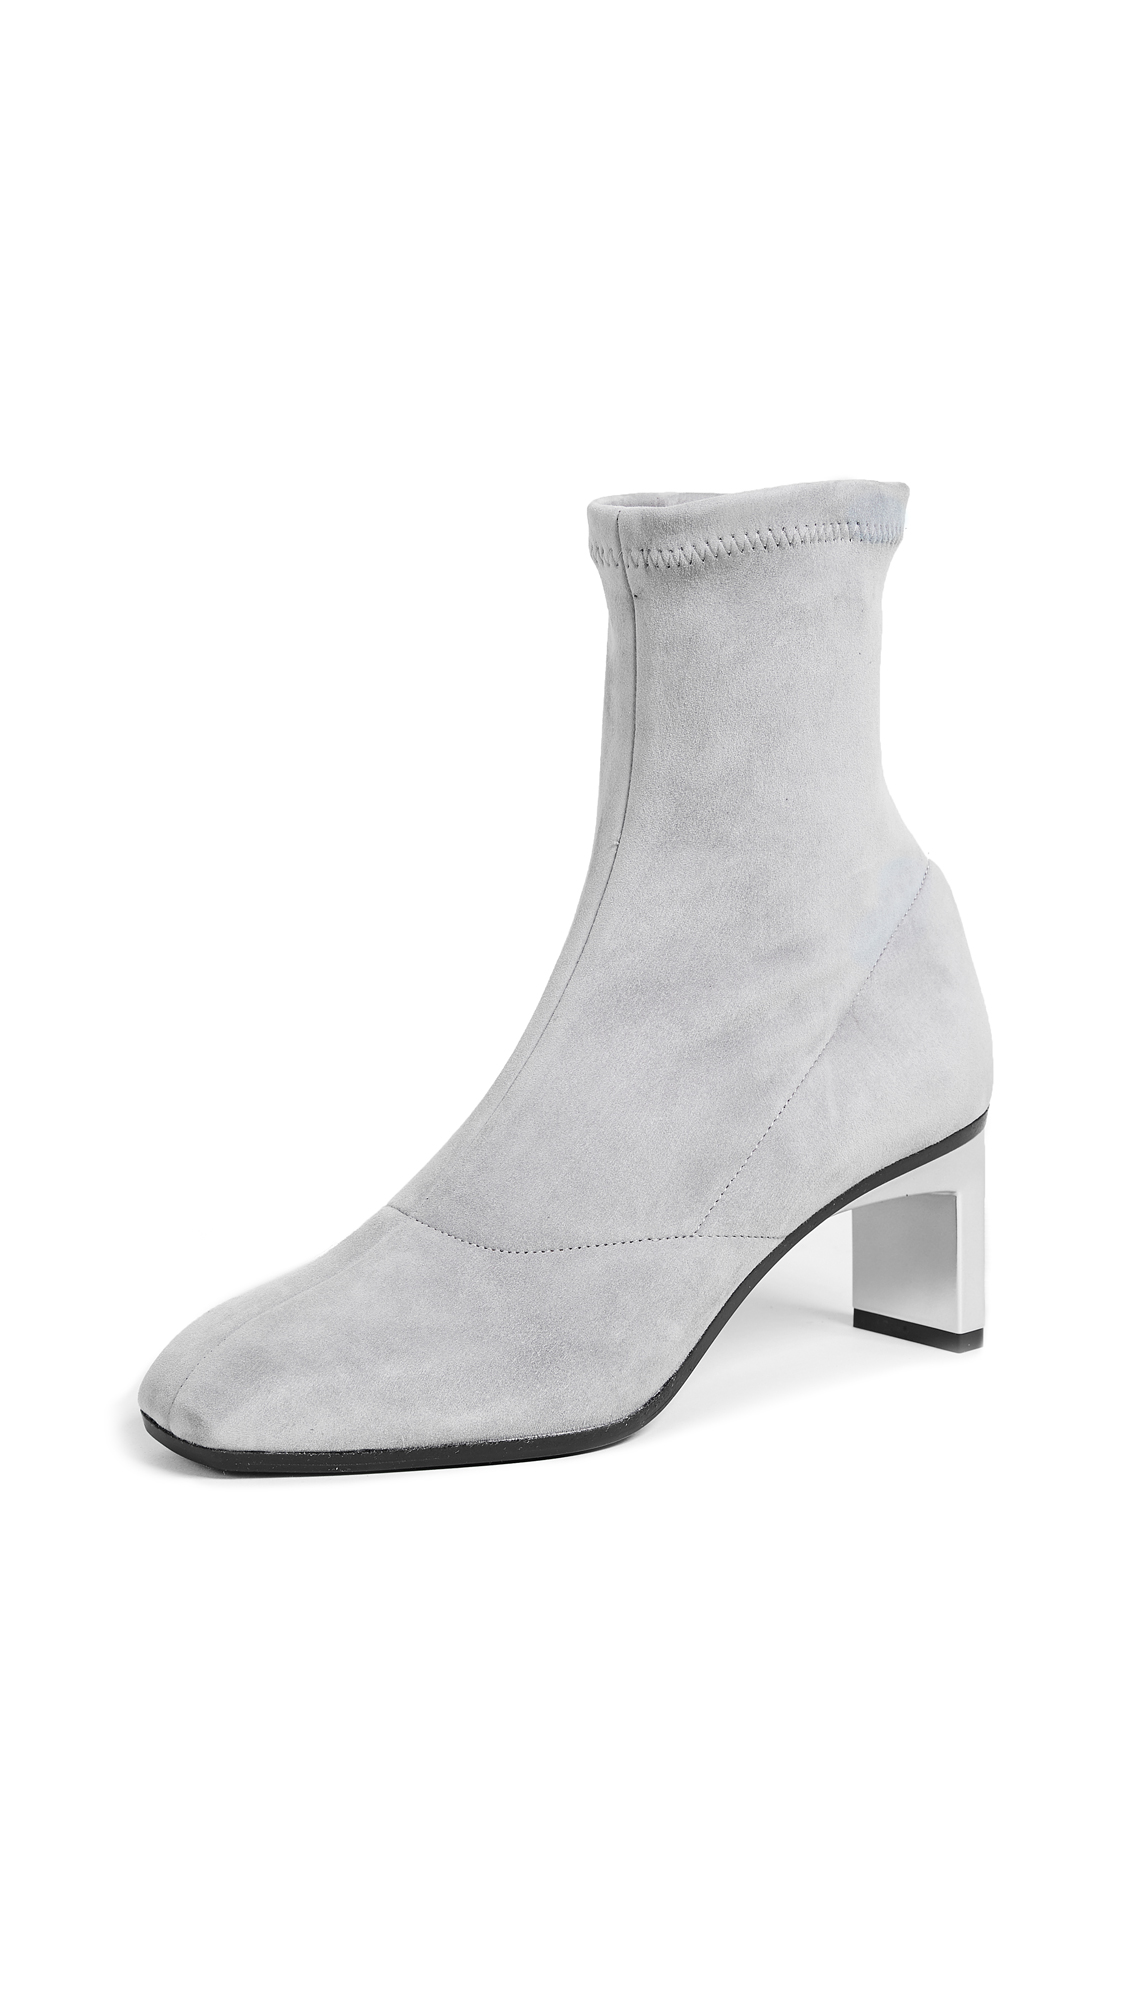 3.1 Phillip Lim Blade Ankle Booties - Fog